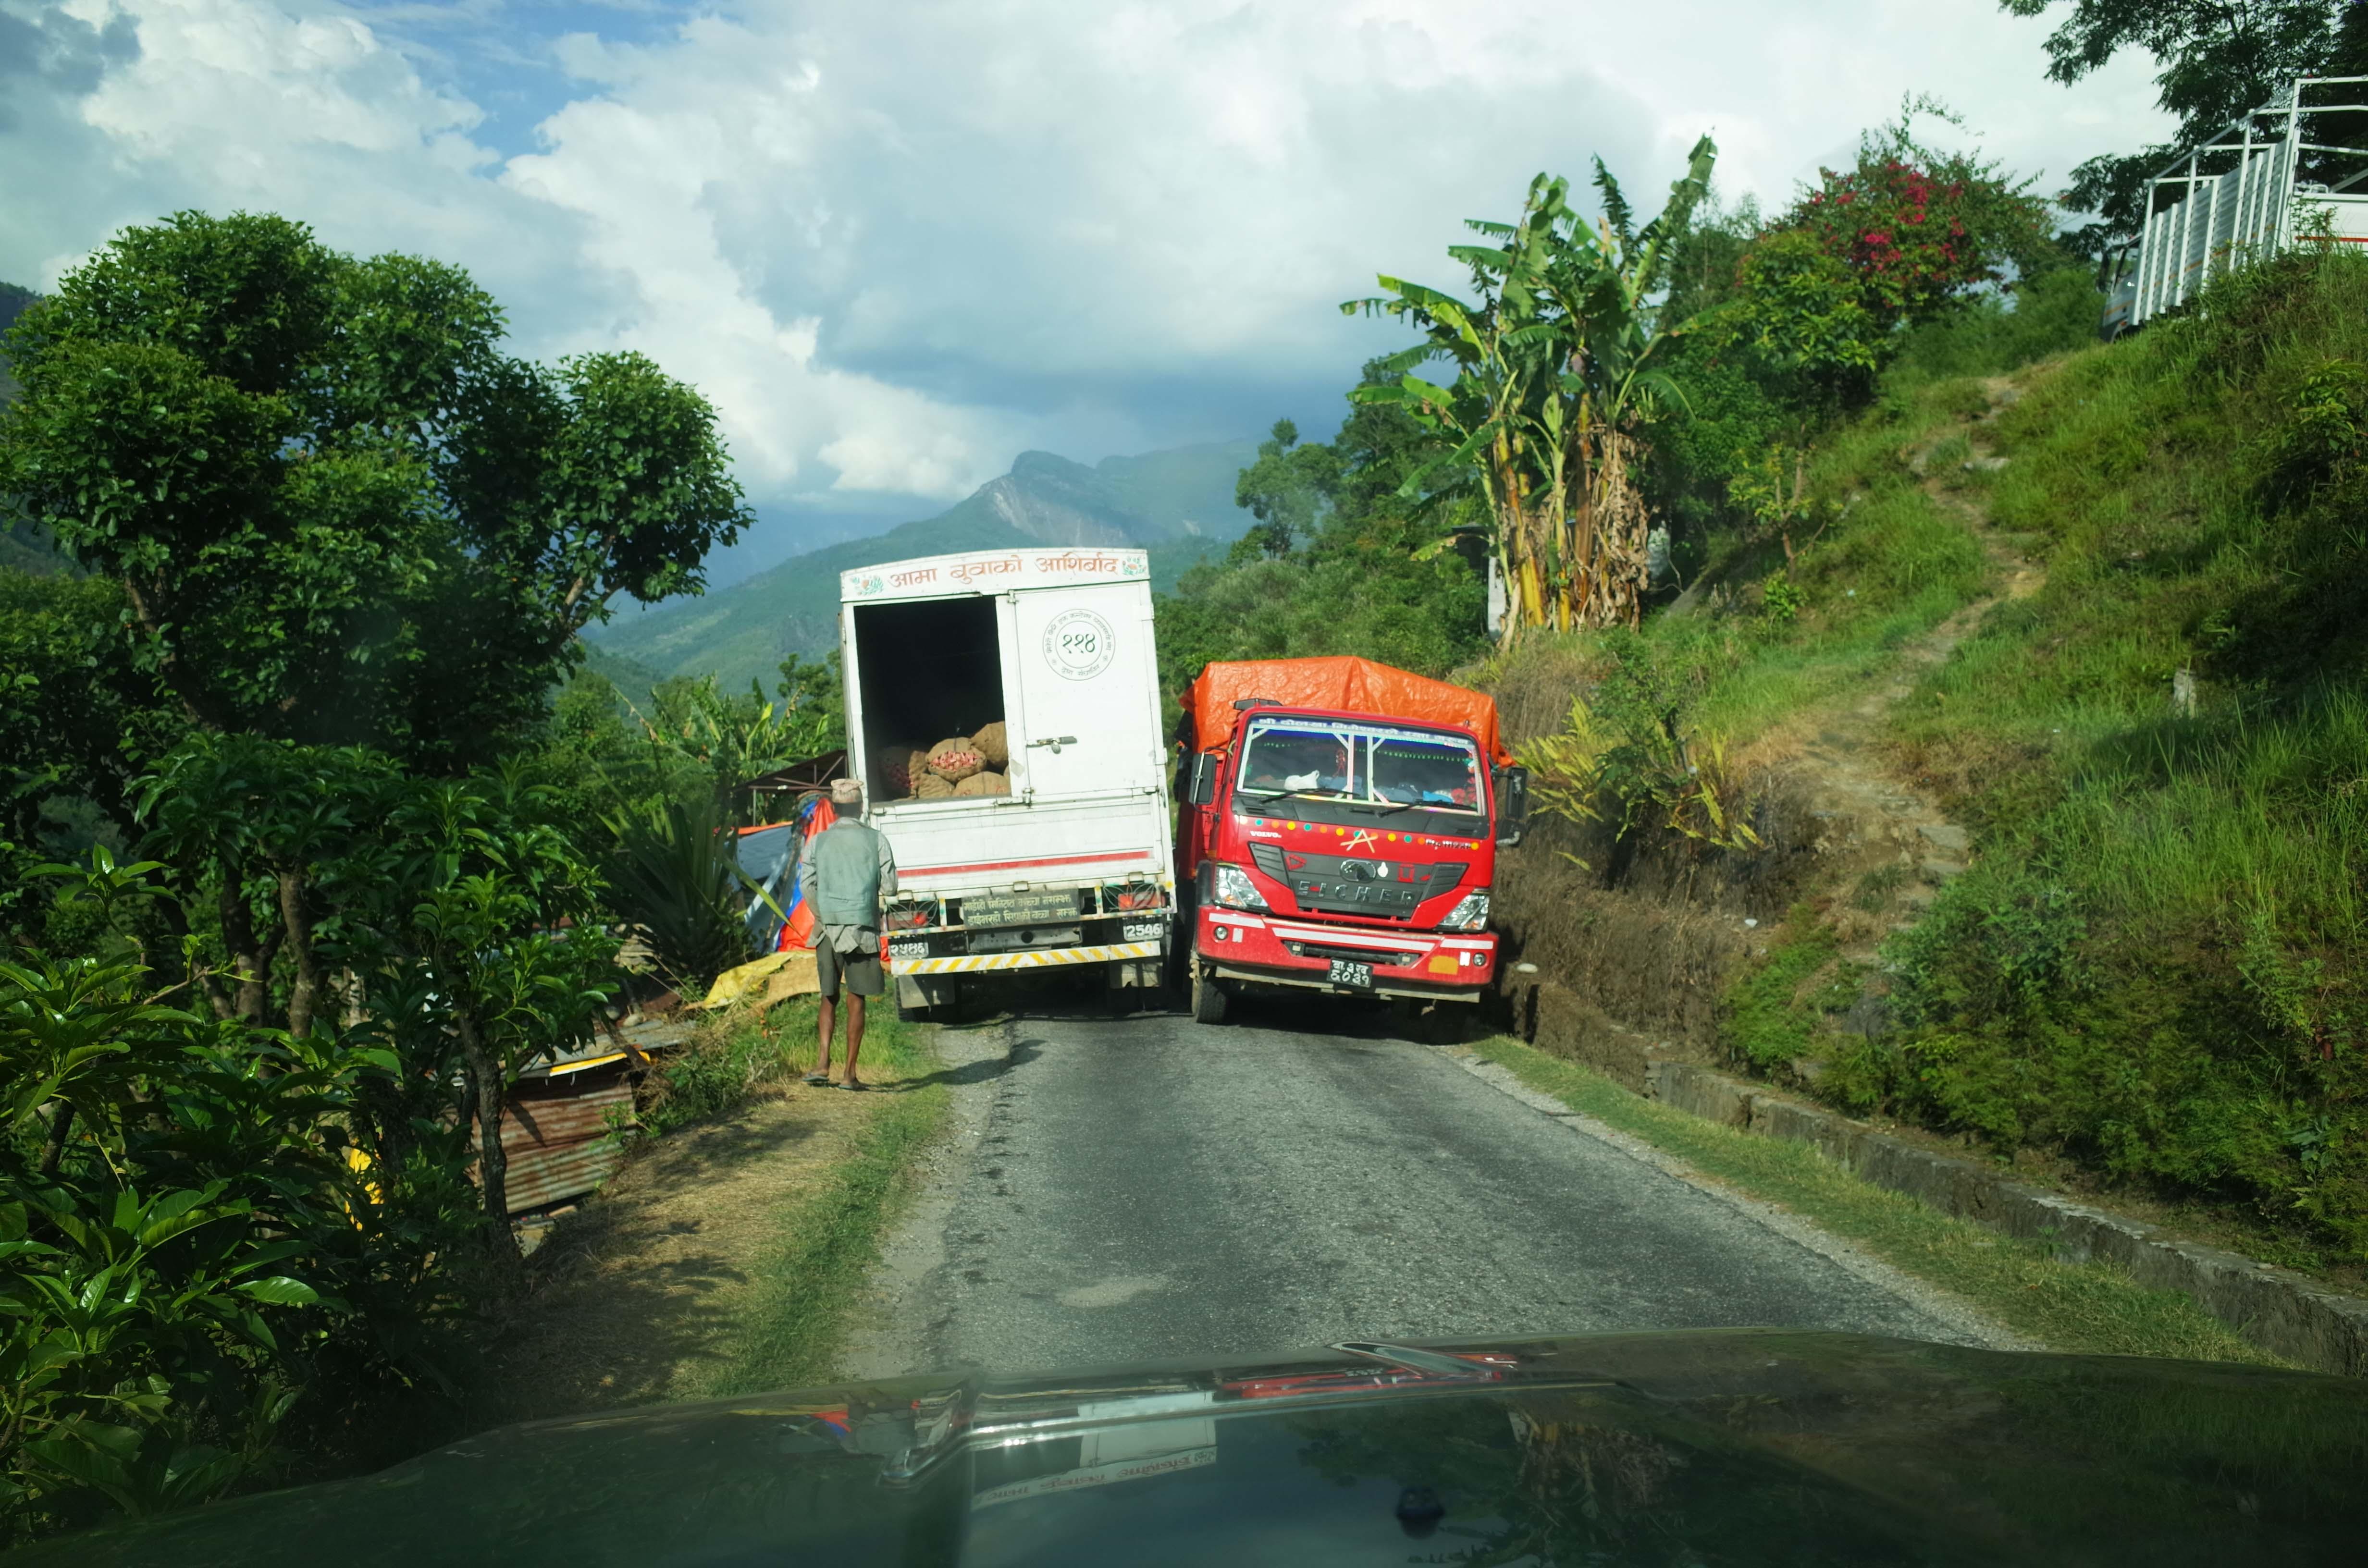 narrow roads